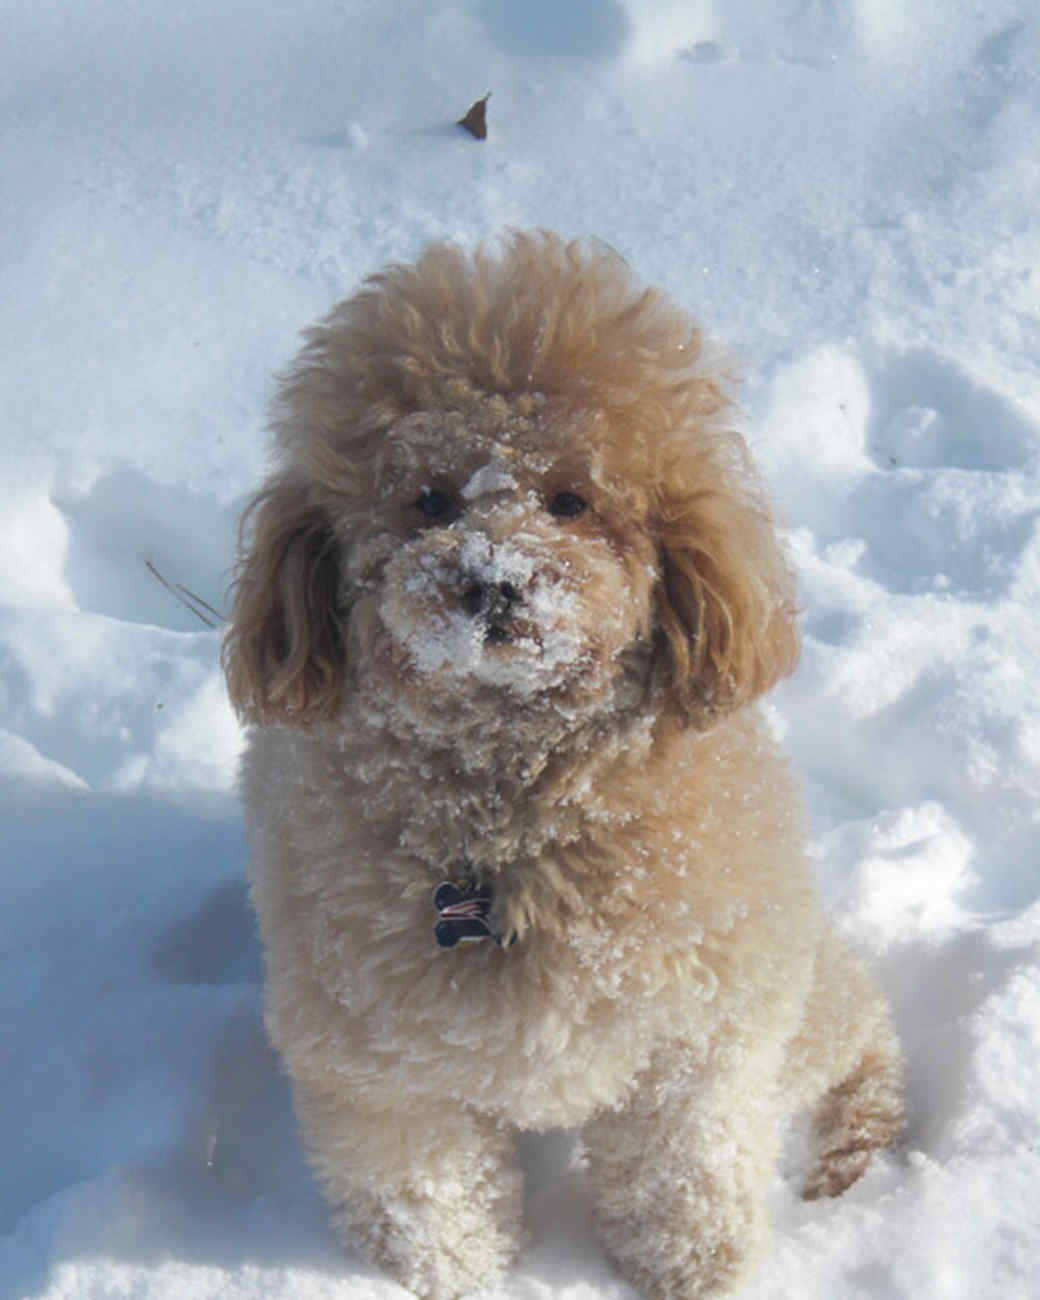 pets_snowangels_7268010_122717_19176171.jpg